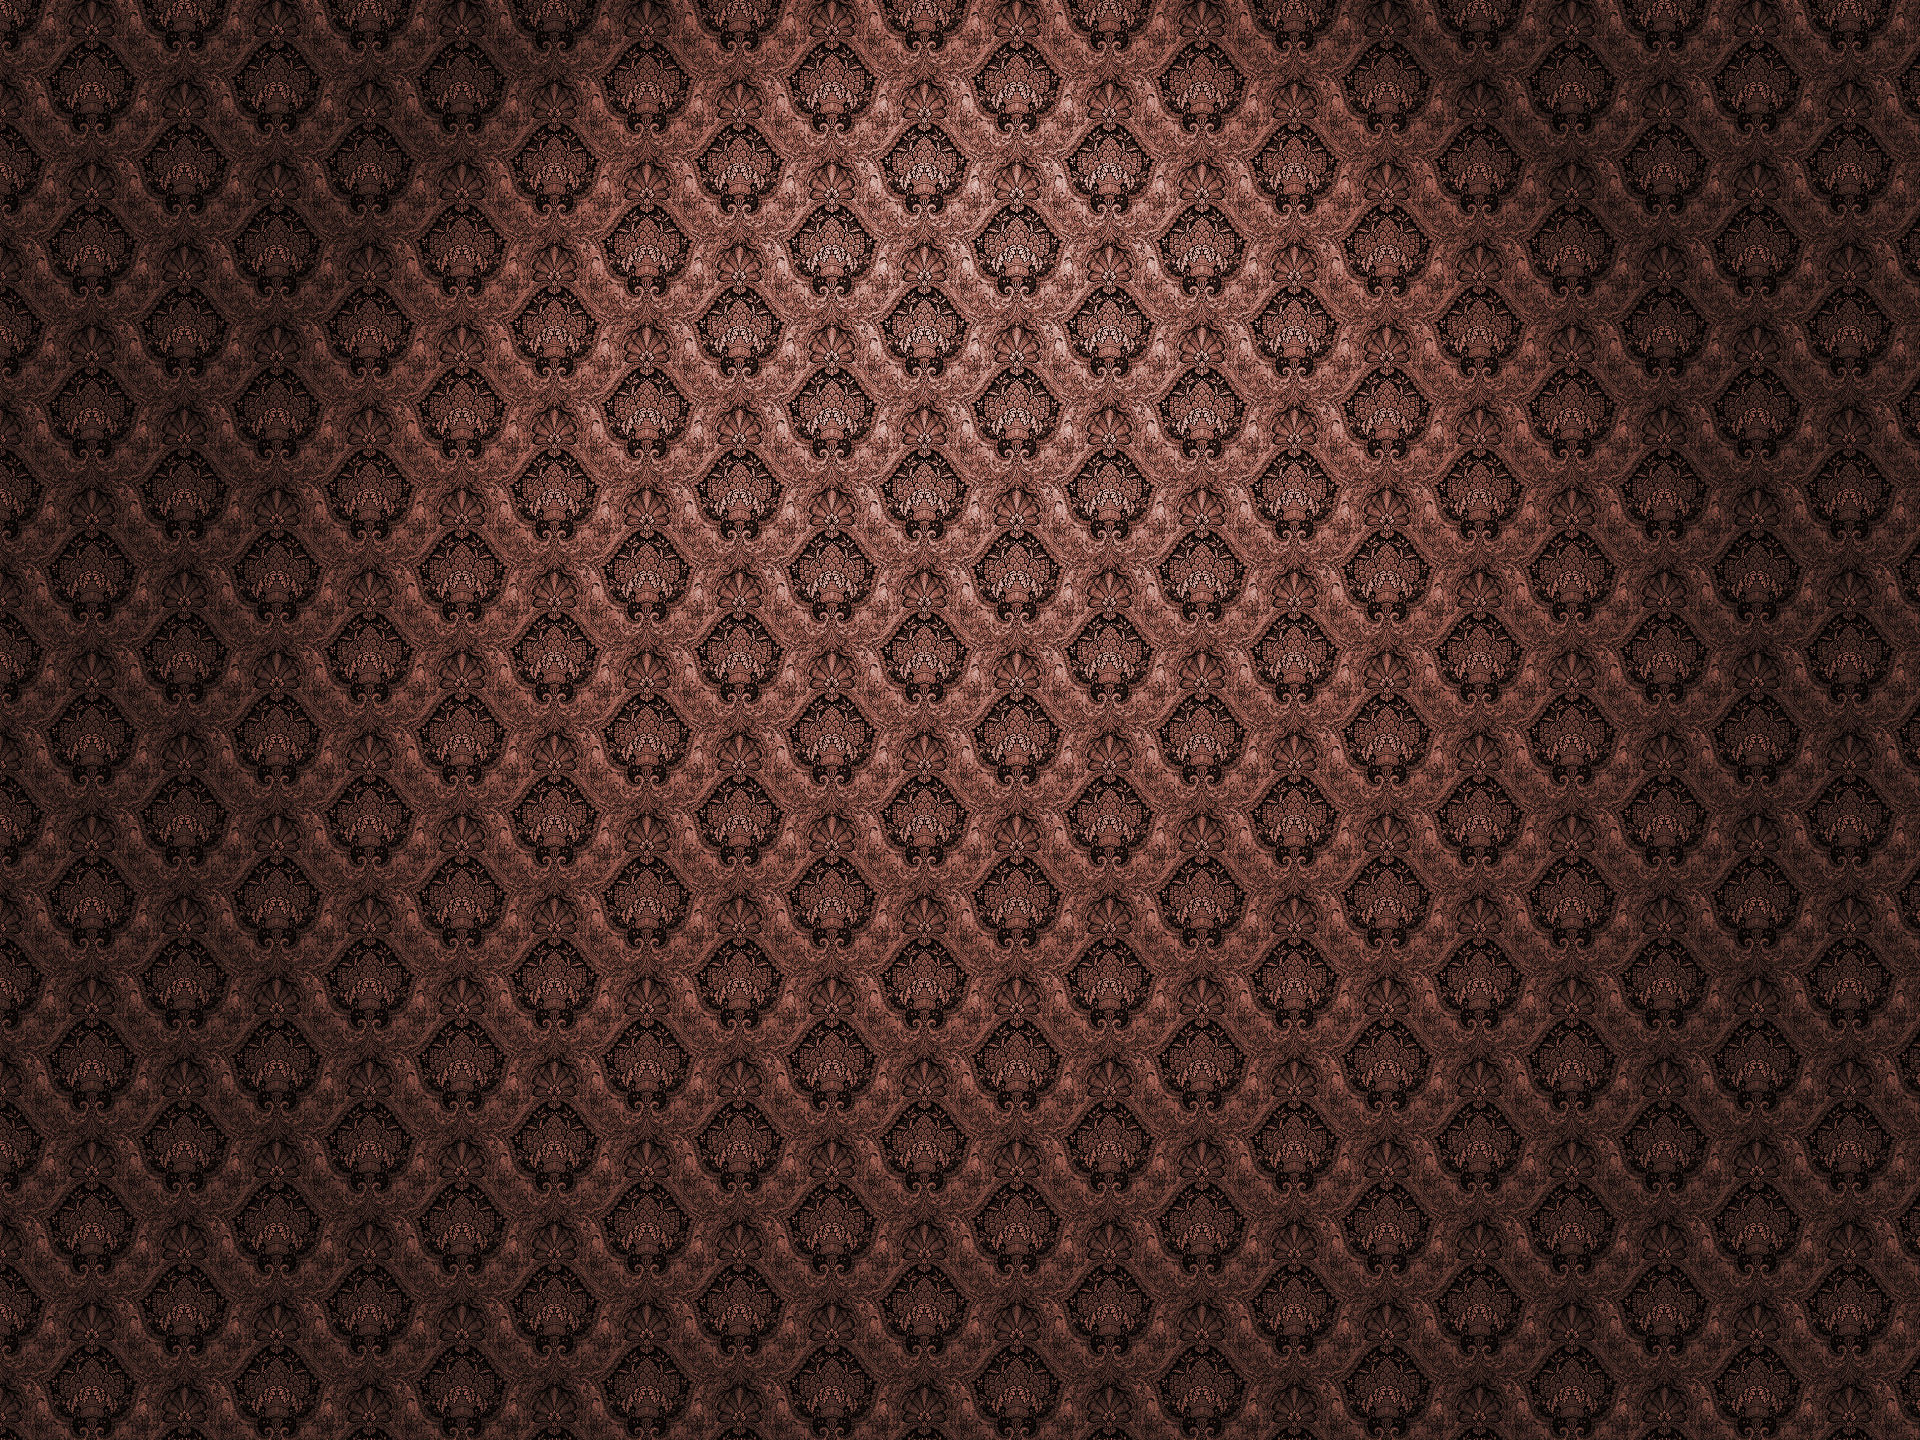 Vintage Patterns Wallpaper 1920x1440 Vintage Patterns 1920x1440